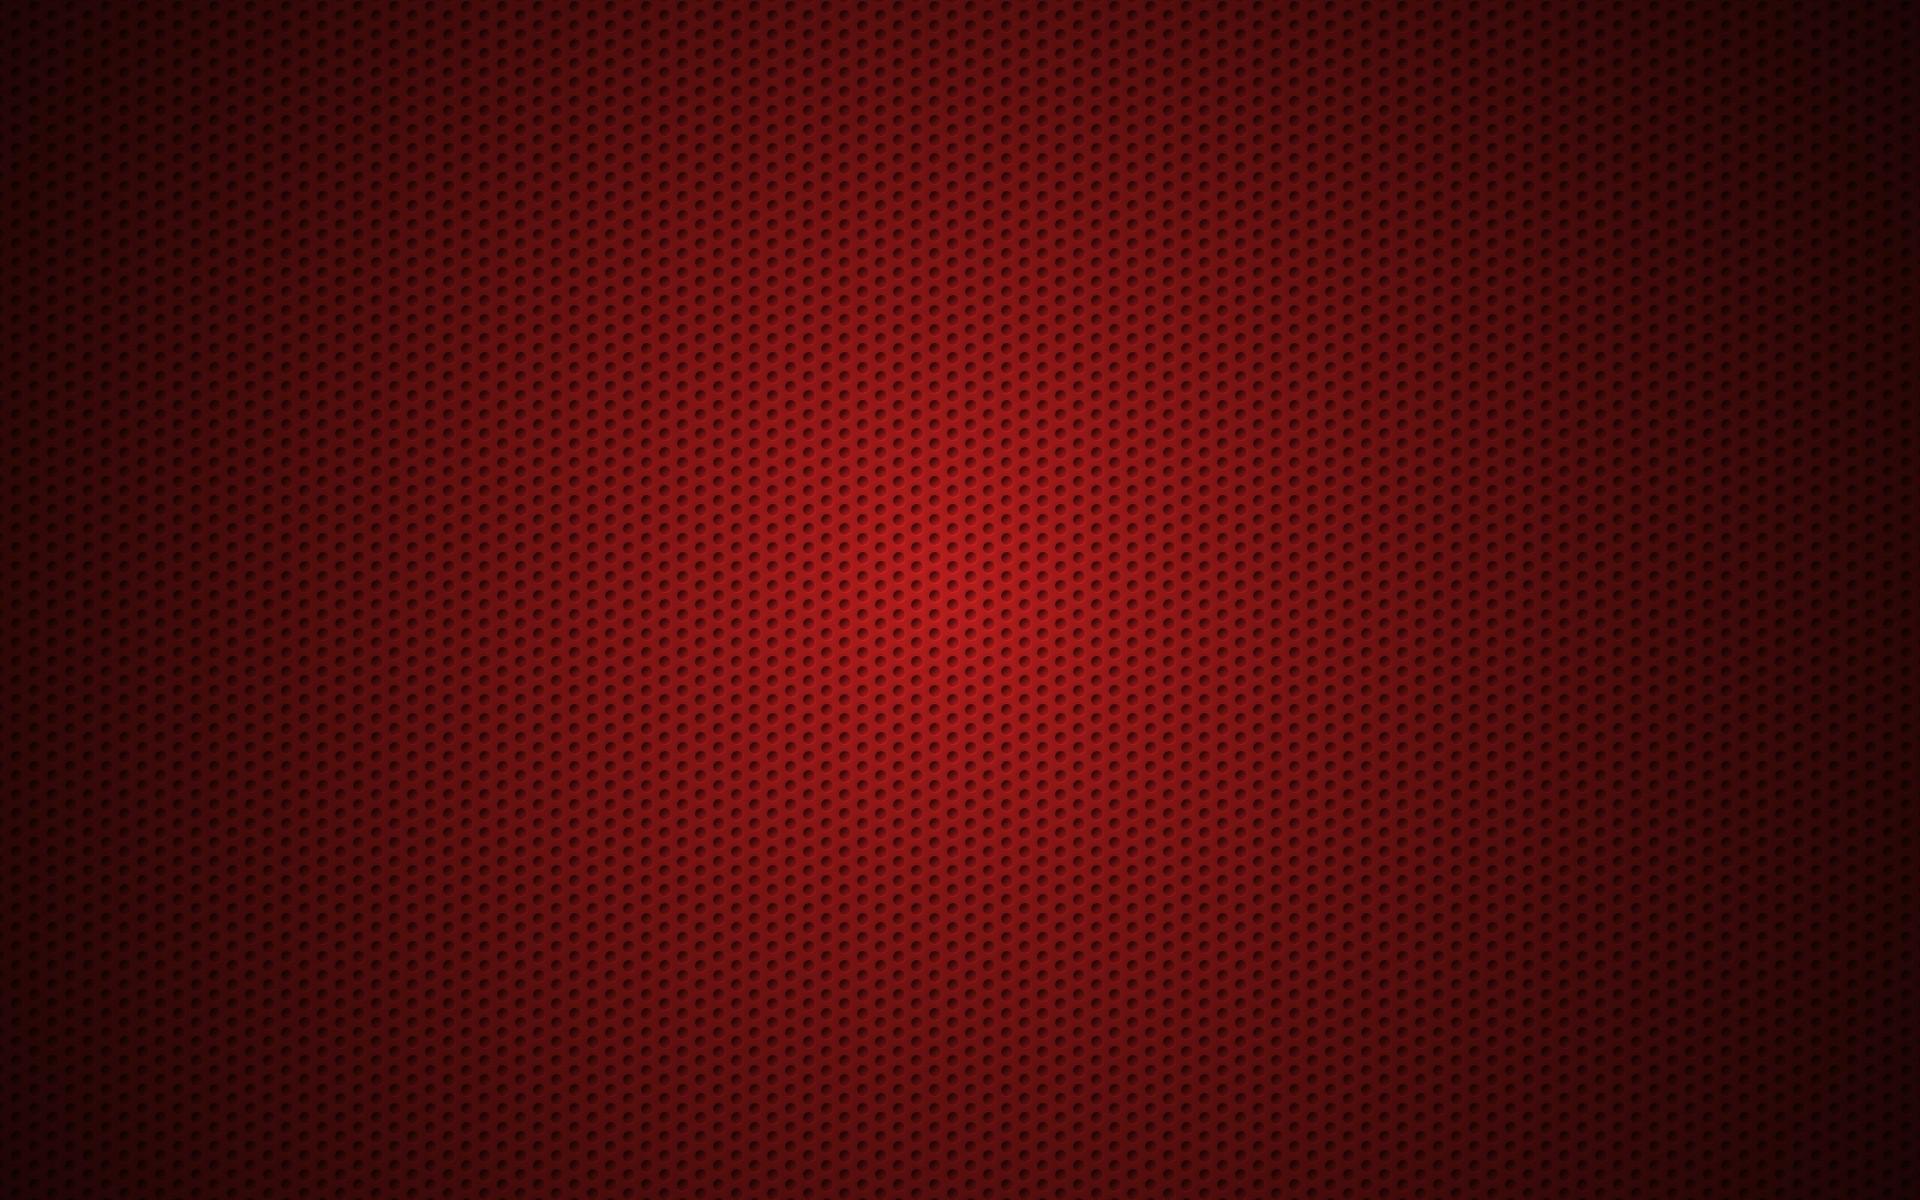 Red Textures Wallpaper 1920x1200 Red Textures 1920x1200